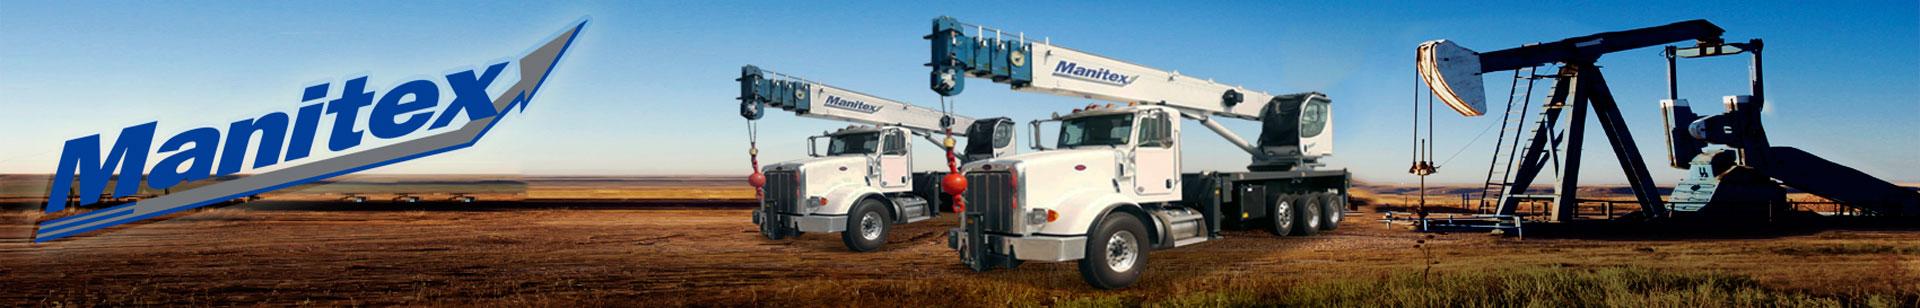 Manitex Cranes and Boom Trucks for Sale